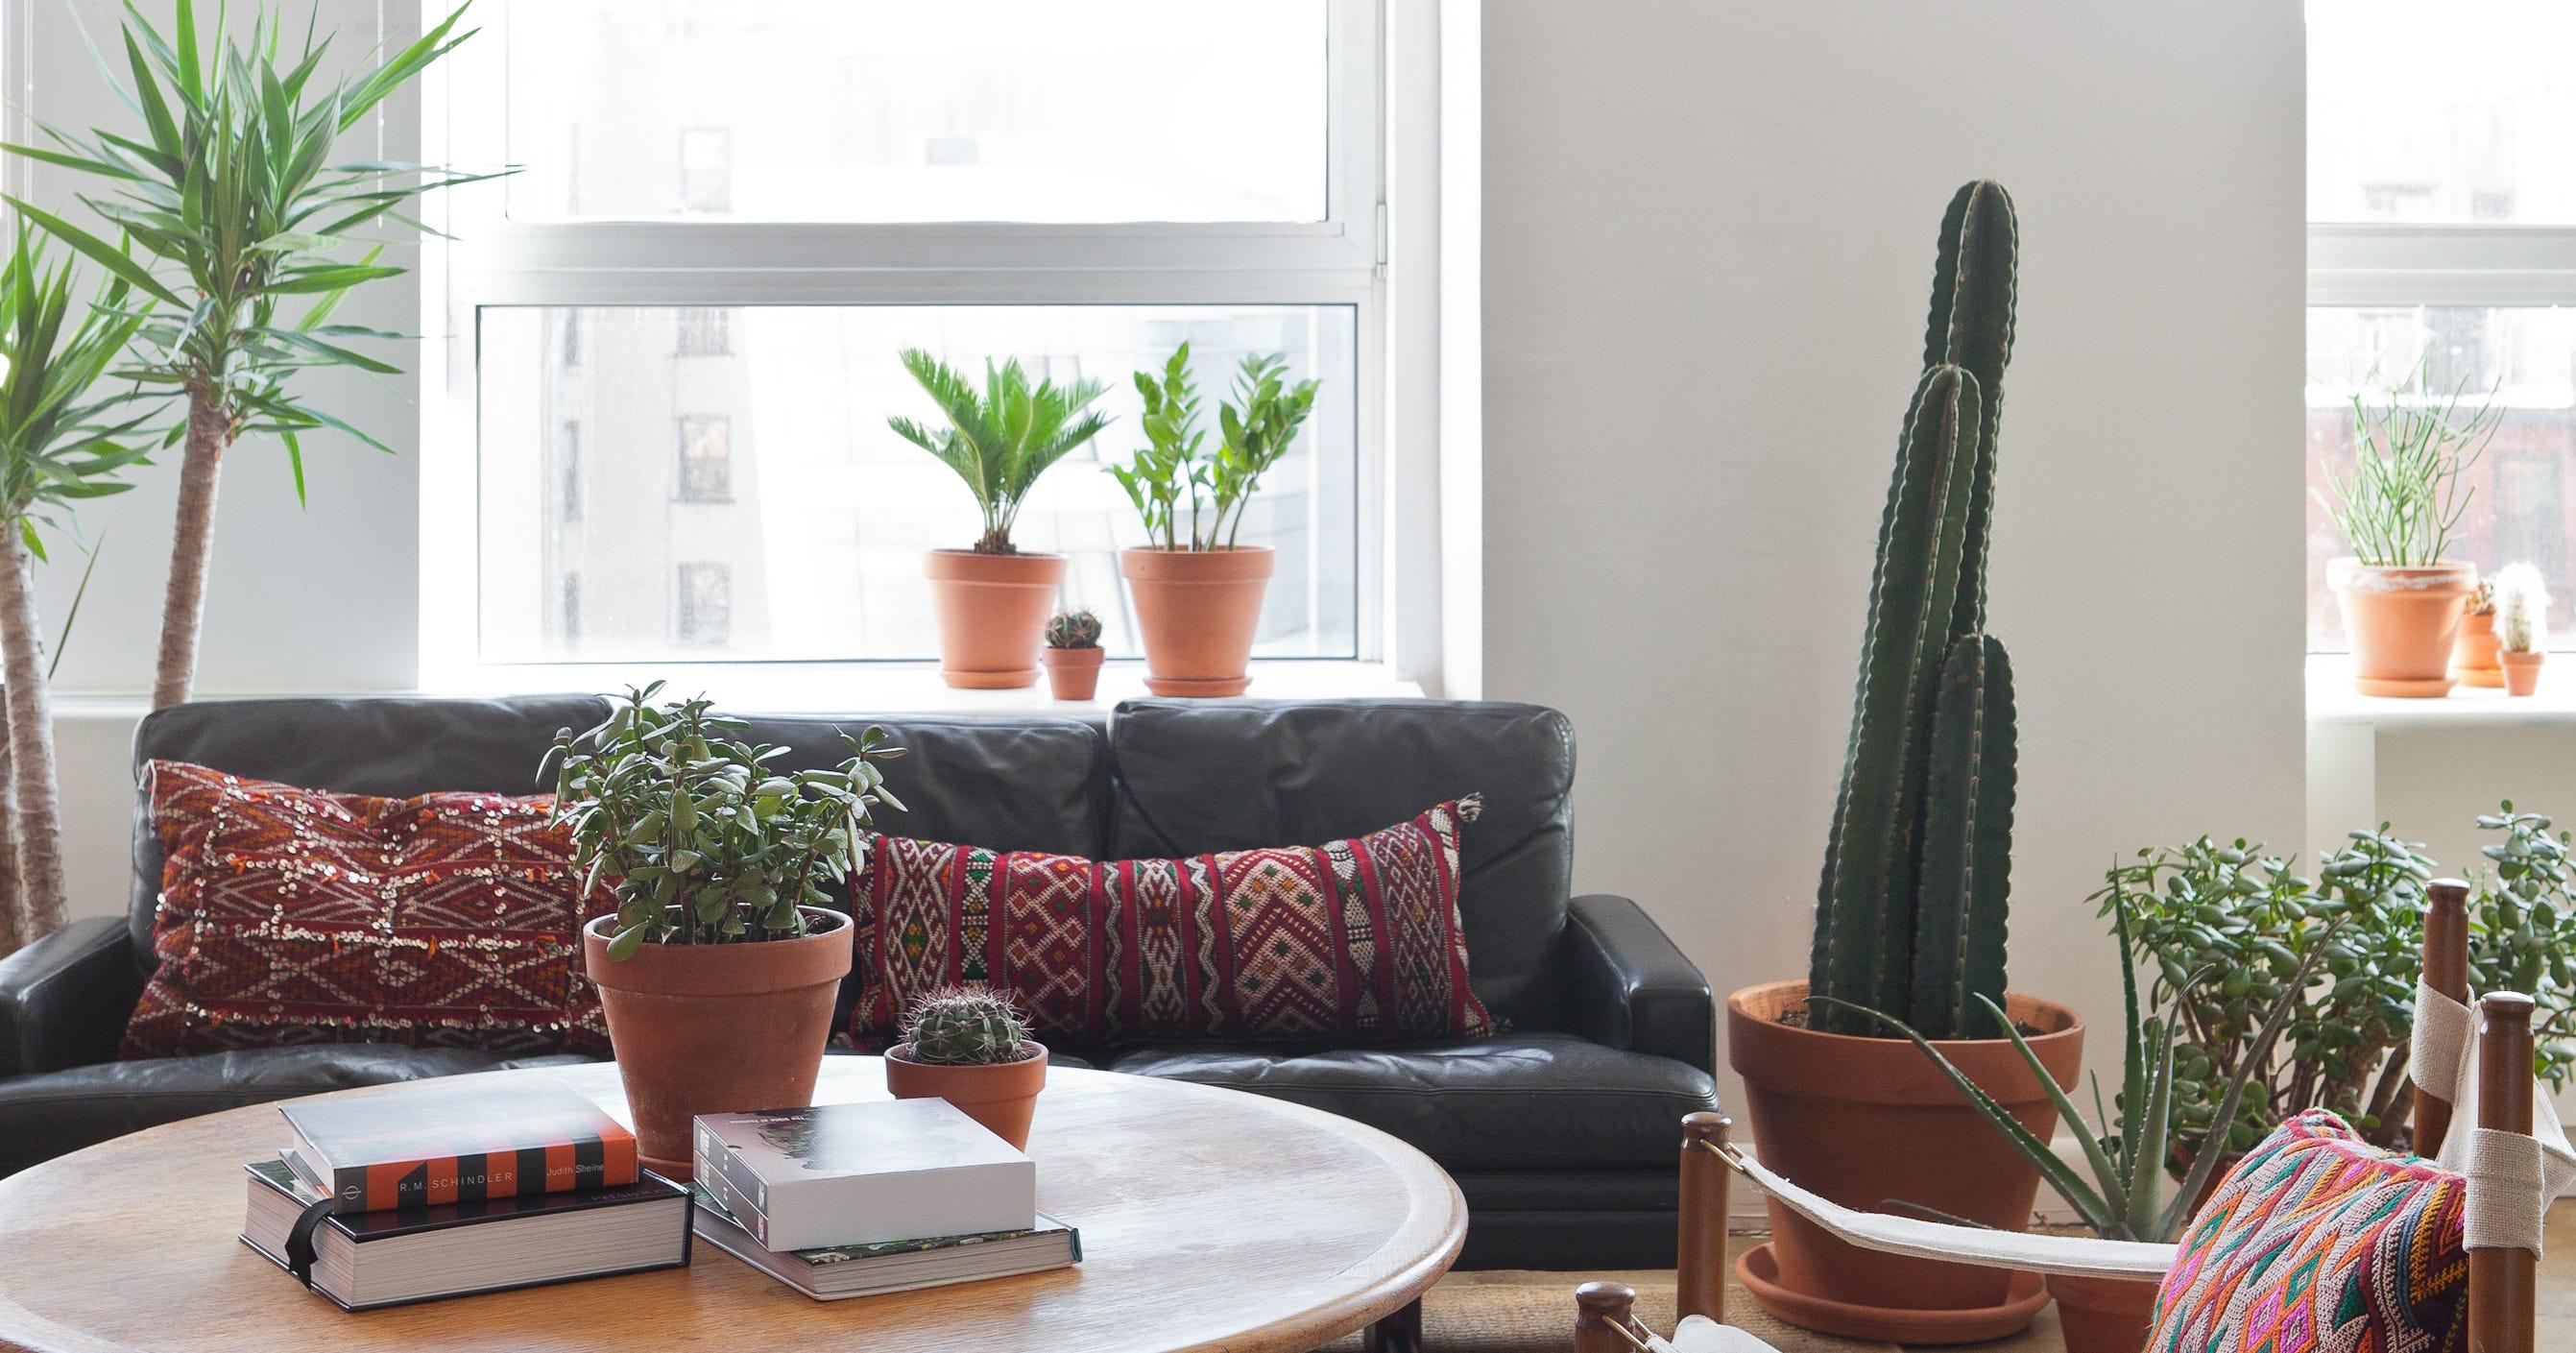 Home Decor 2018 Wystawcy: Popular Interior Styling Tips